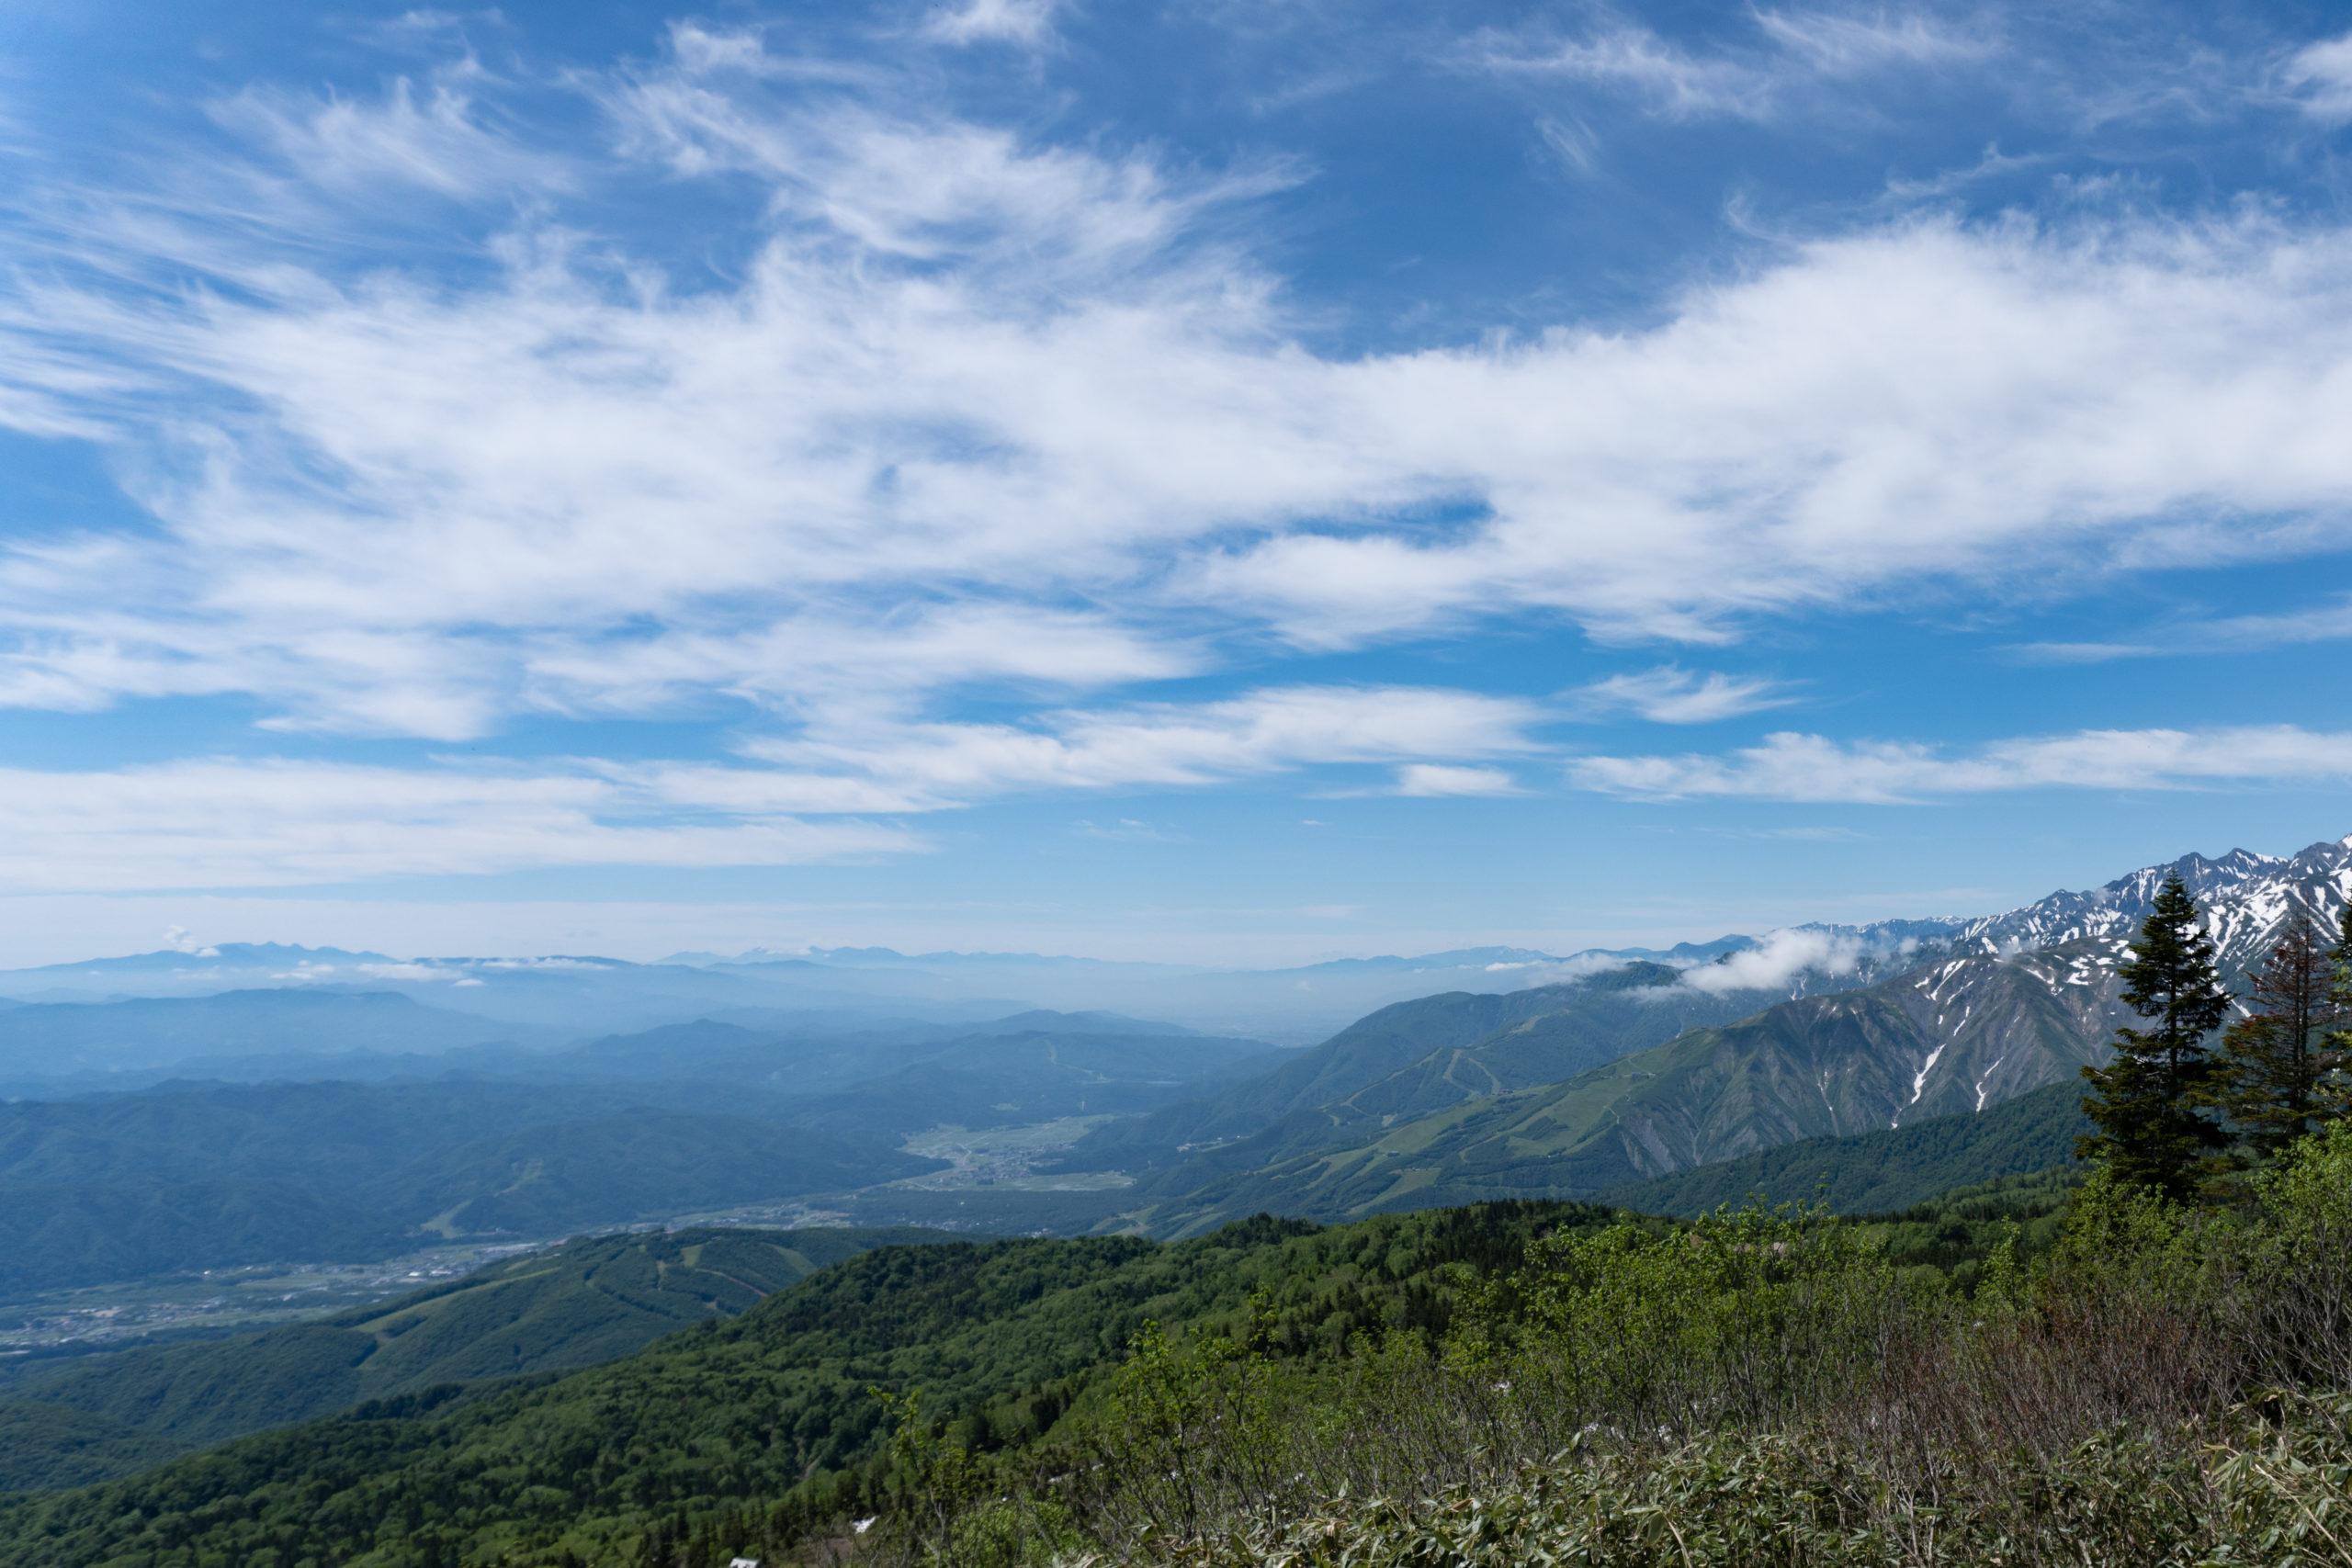 Tengu no Hara Hike - Tsugaike Hiking June 17th (25 of 40)